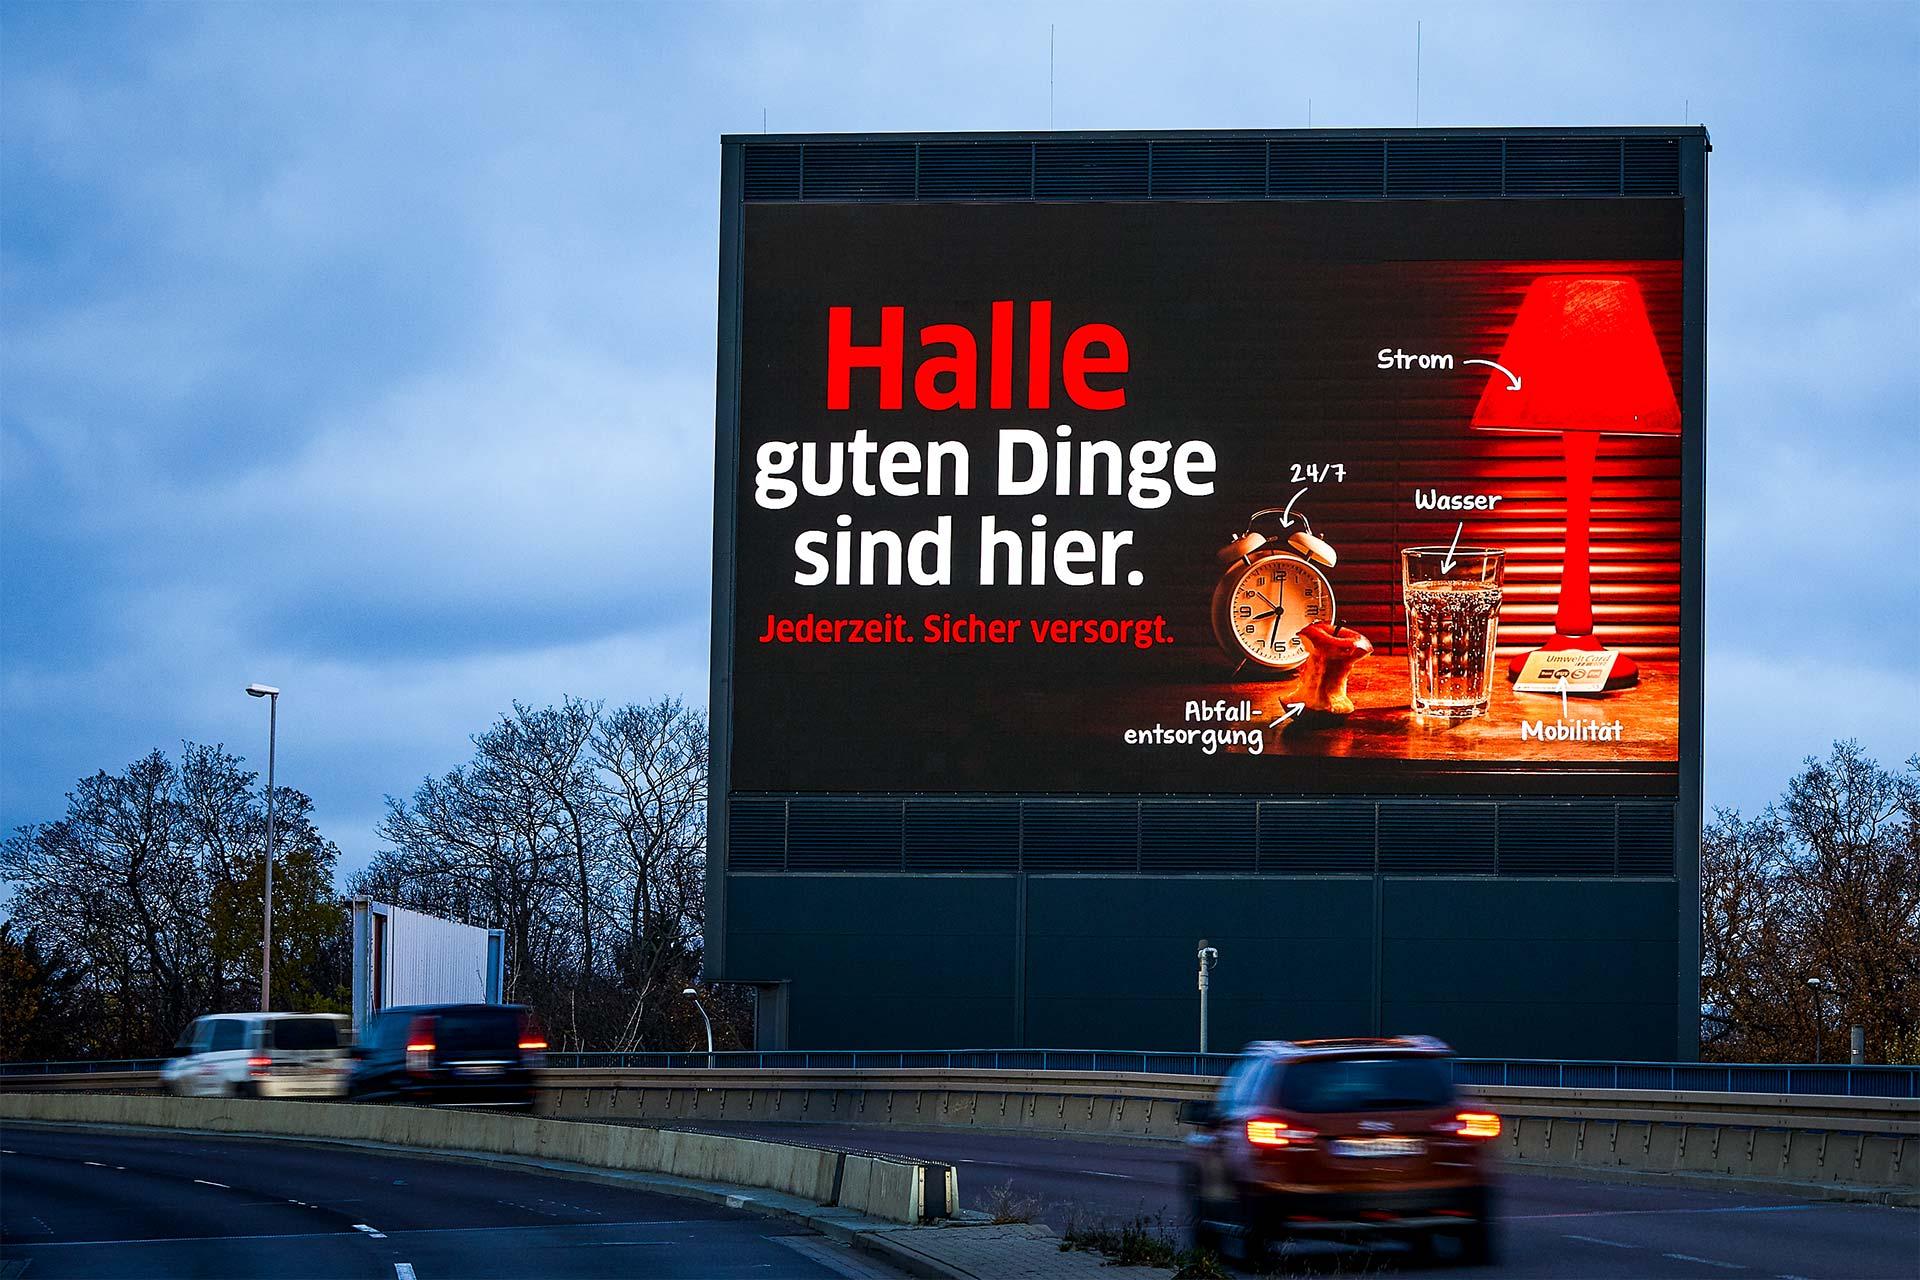 City Light Stadtwerke Halle